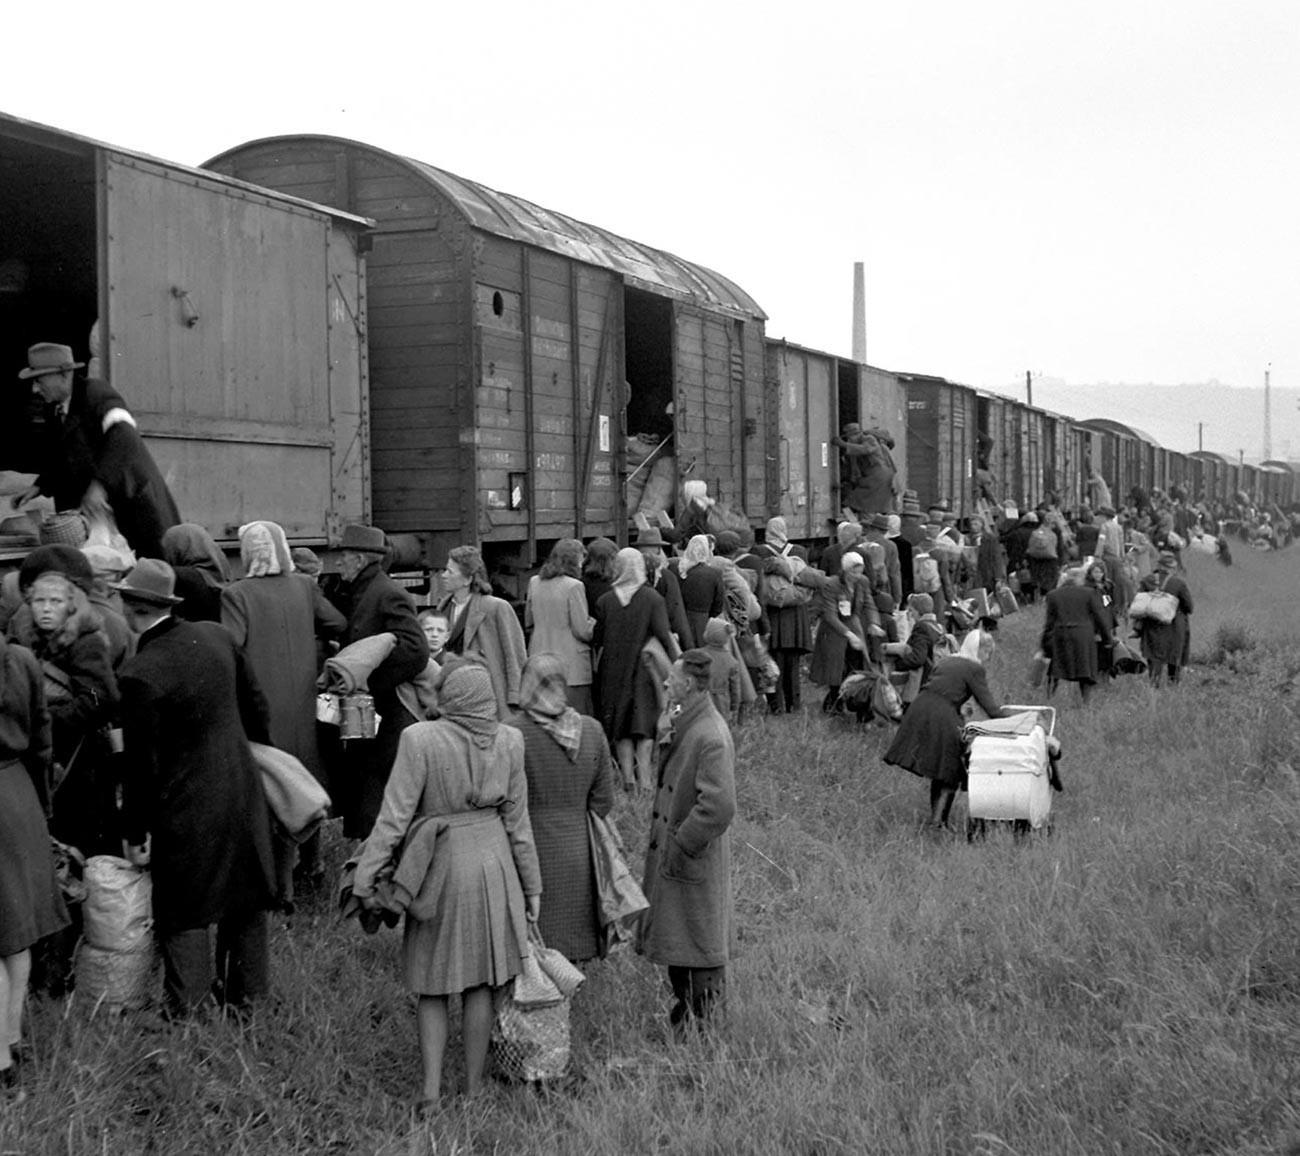 Orang-orang Jerman yang hendak dideportasi.